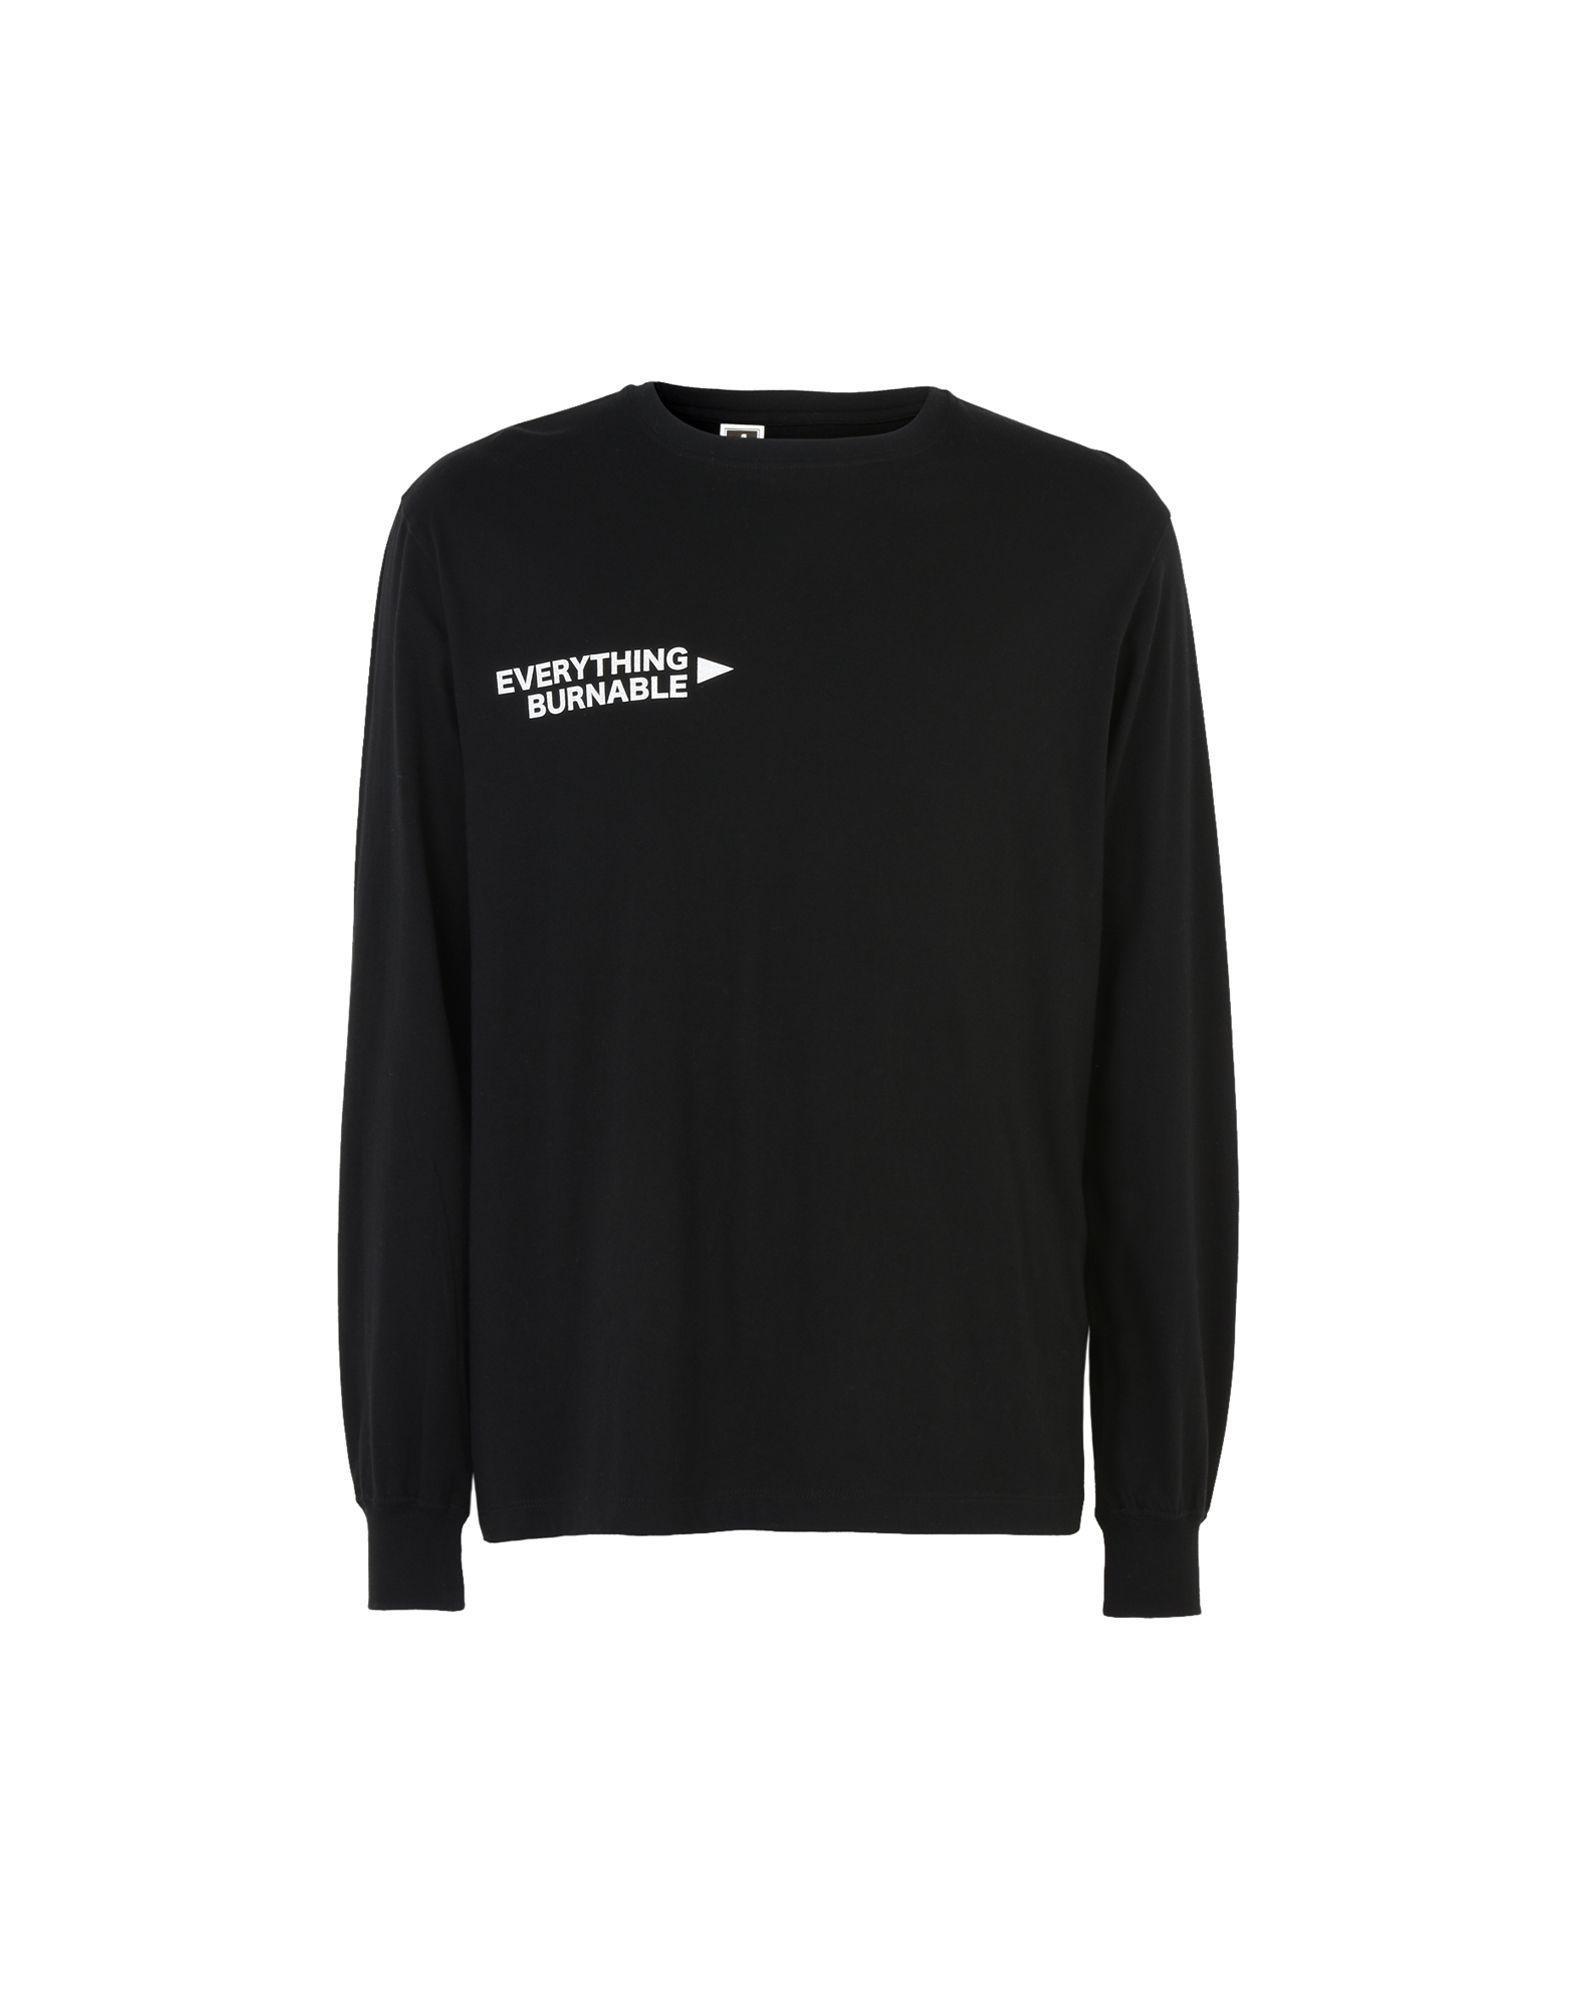 Society Sports T-shirt In Black